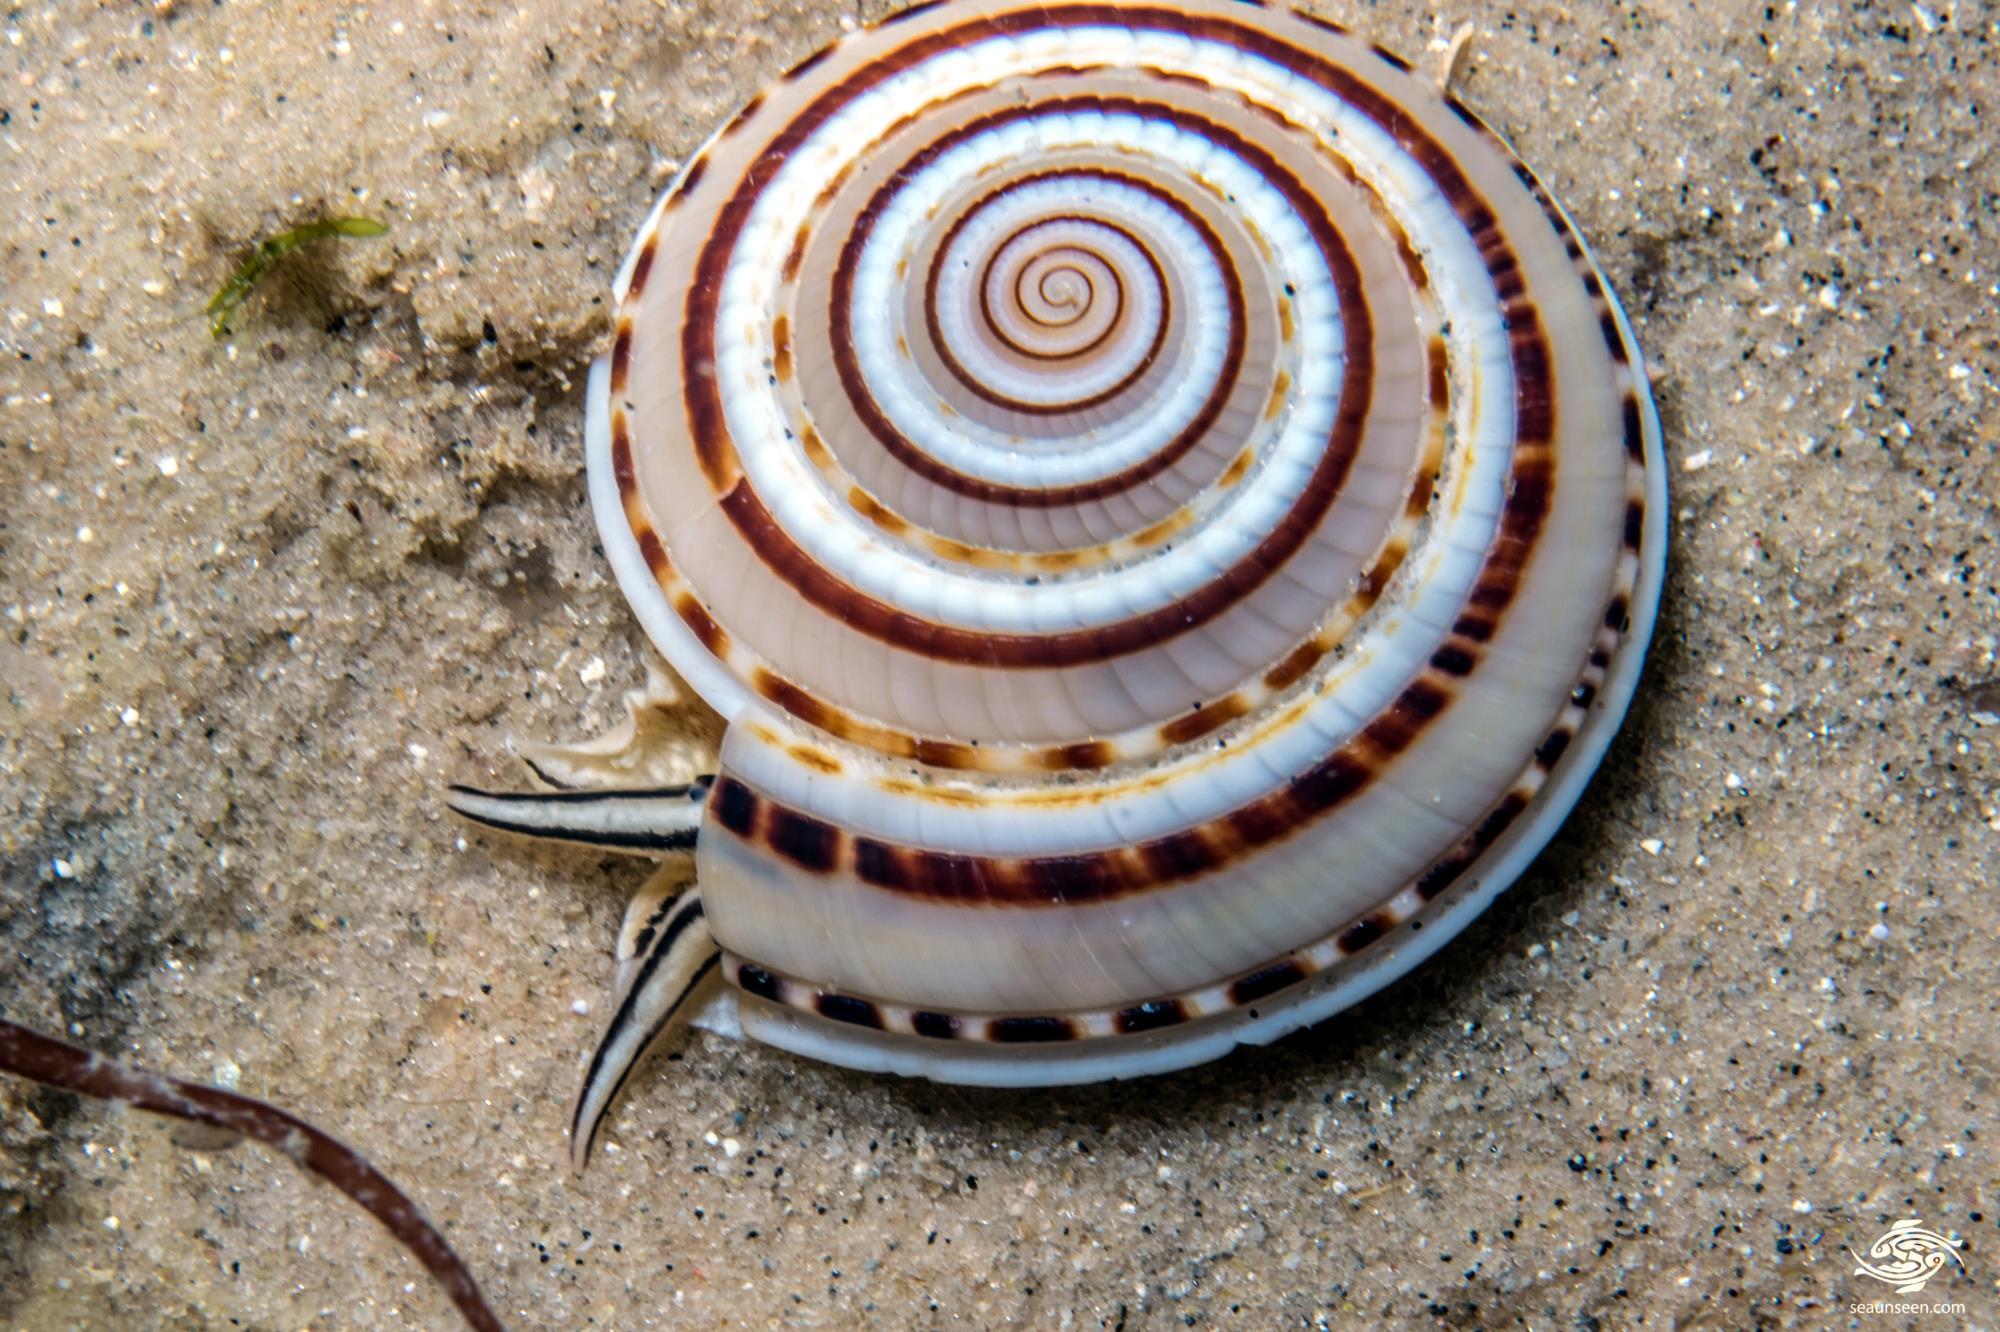 Sundial shell (Architectonica perspectiva)